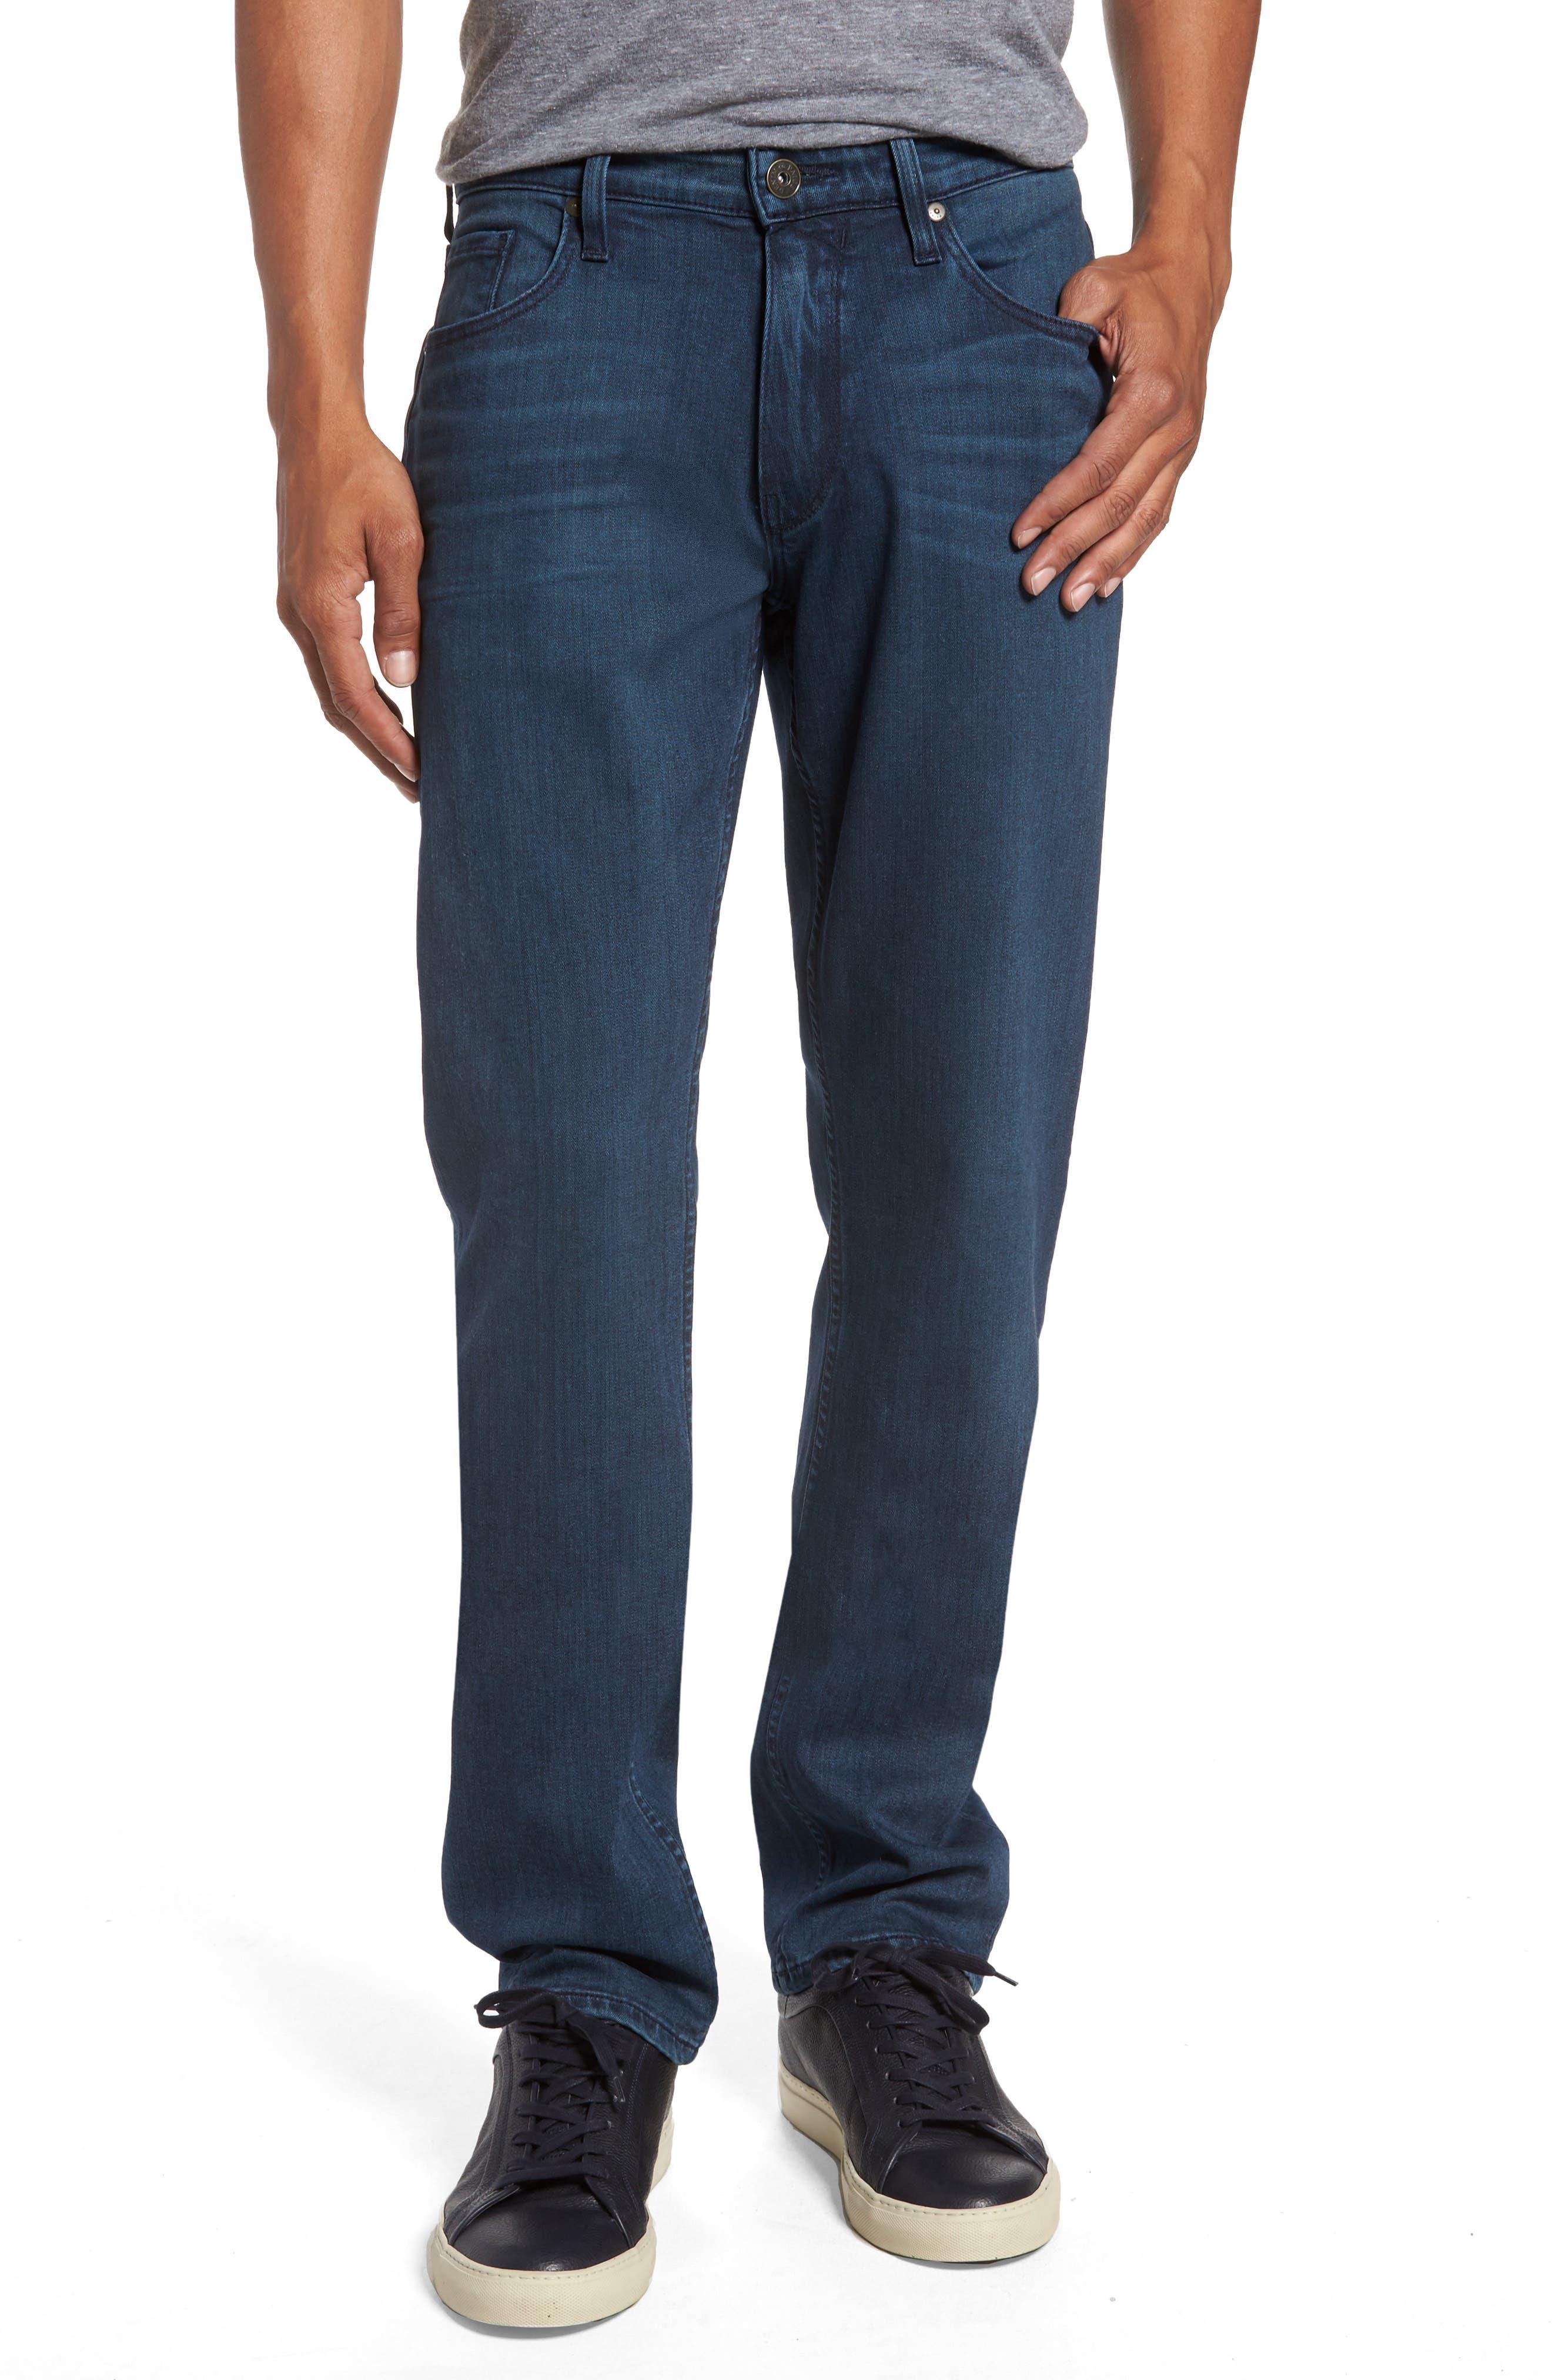 Transcend - Federal Slim Straight Fit Jeans,                         Main,                         color, Elroy